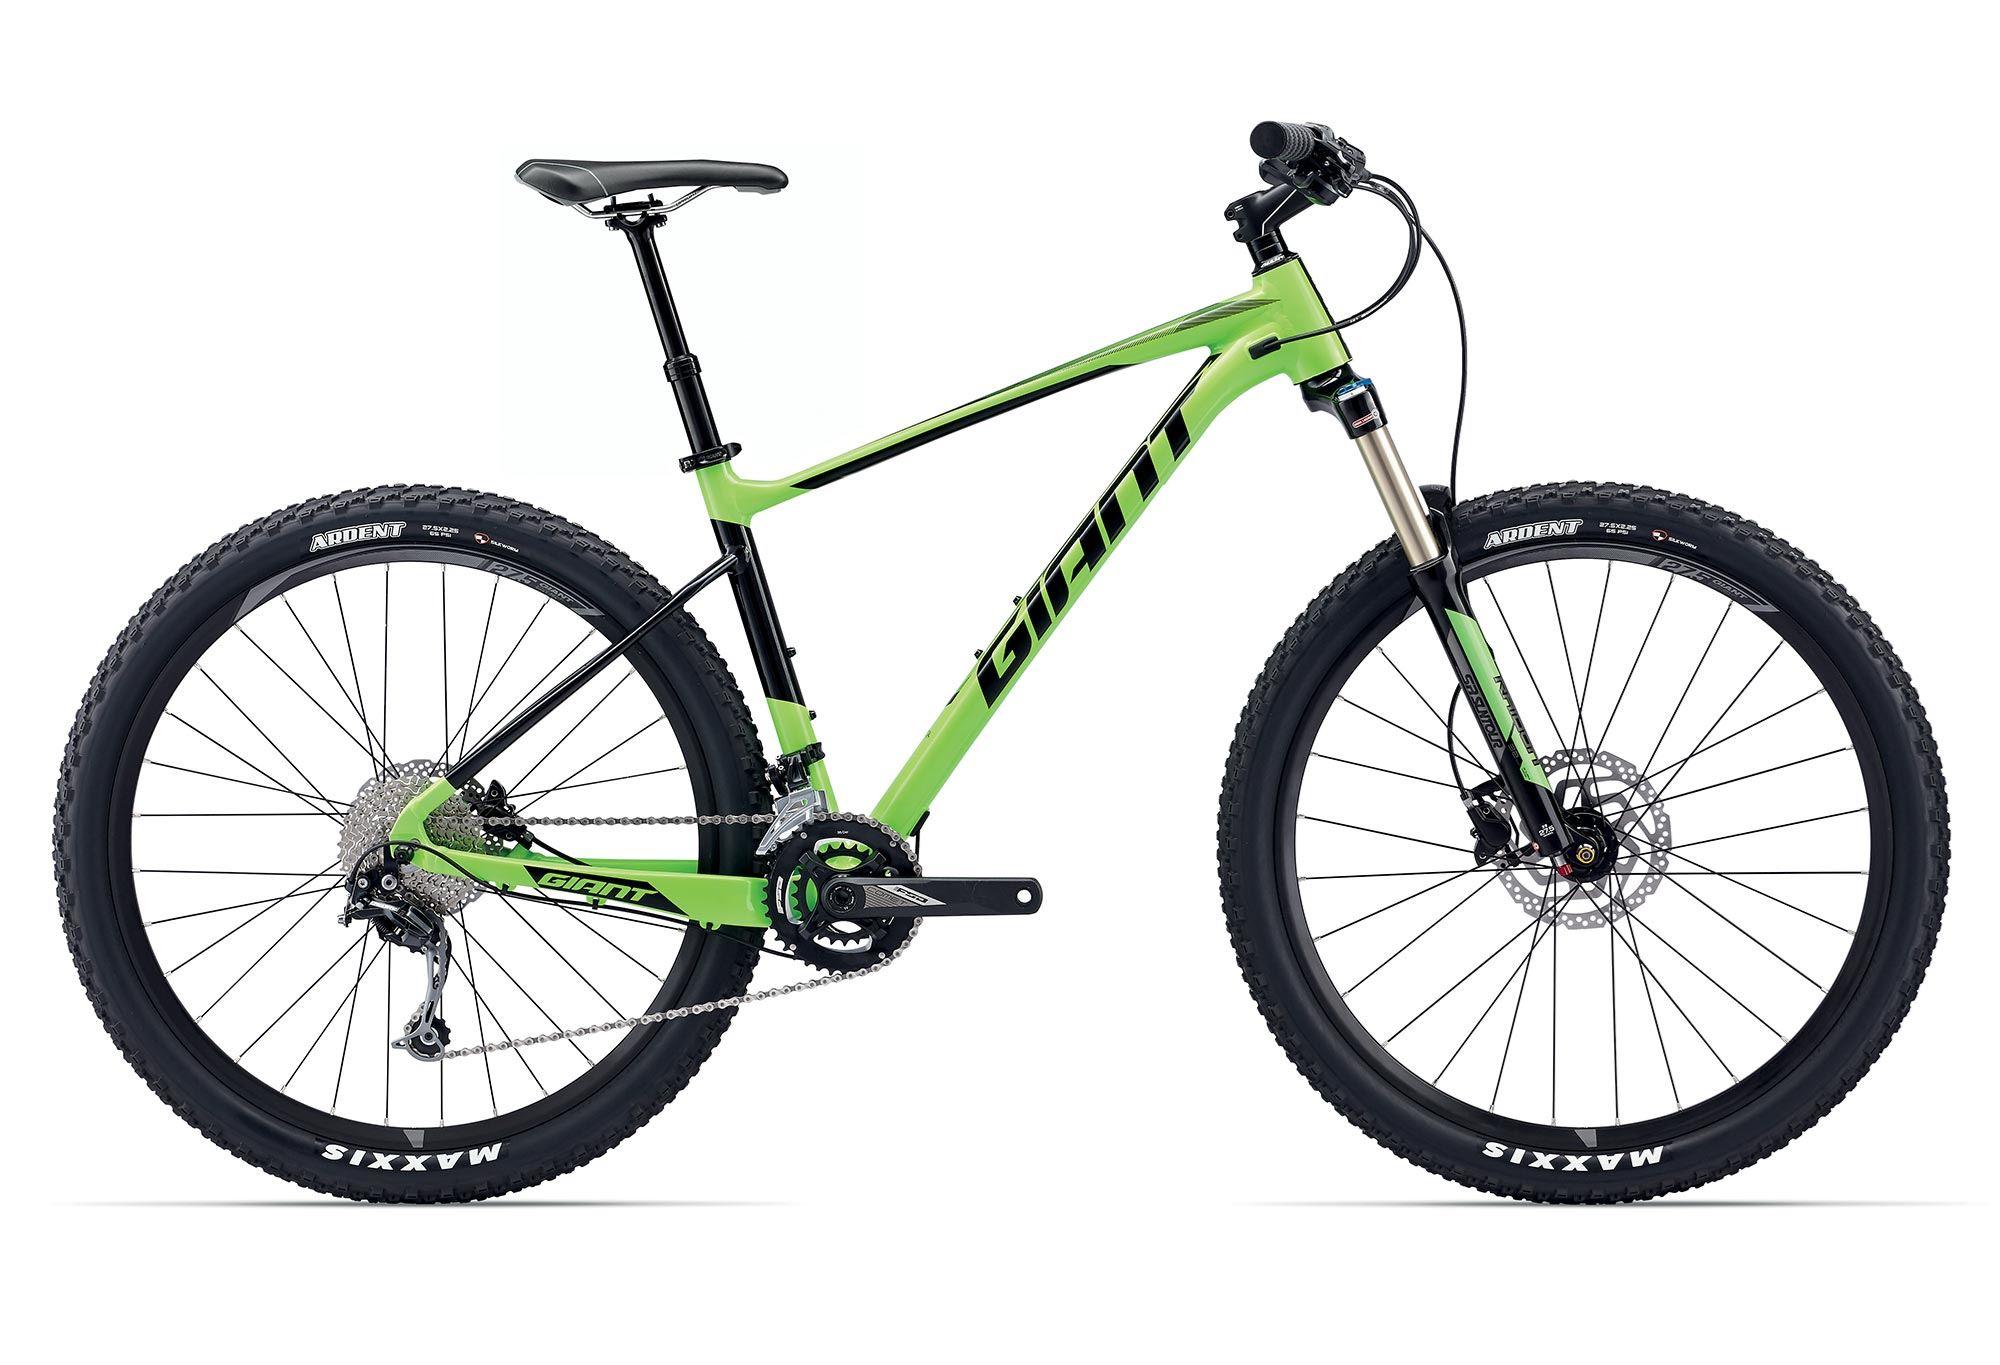 2017 Giant Fathom 2 £799